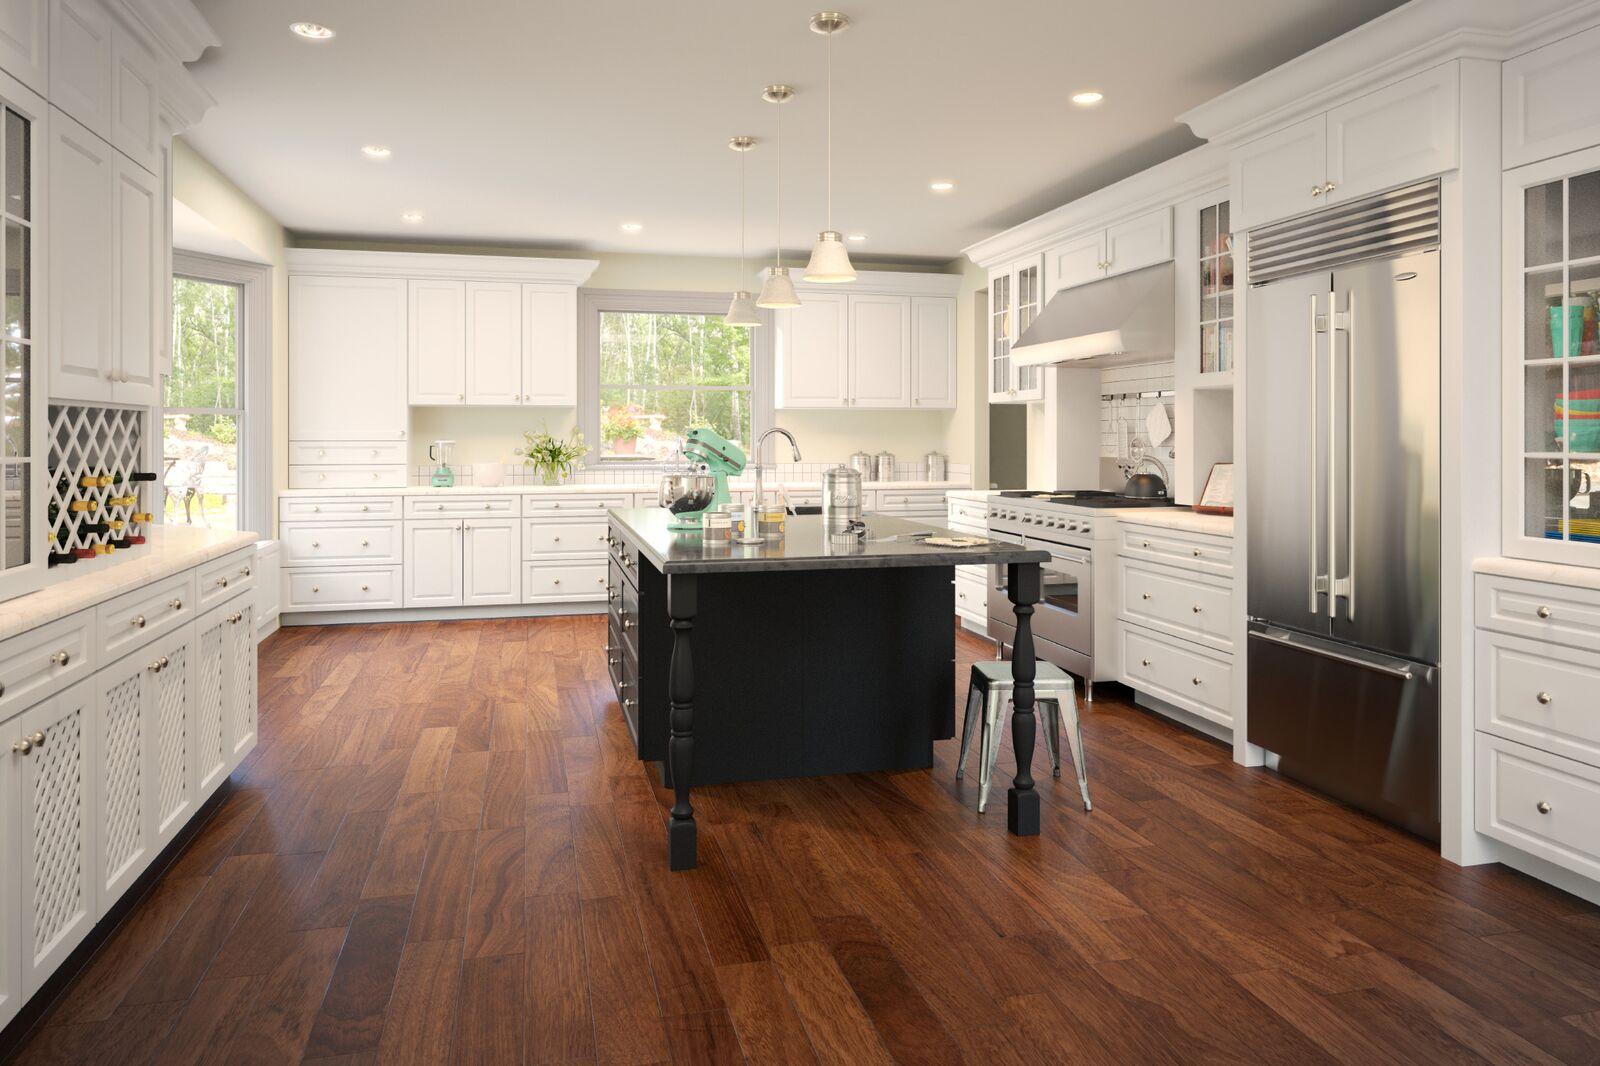 Free estimate kitchen cabinets - Gramercy White 5day Cabinets All Wood Kitchen Cabinets Sales Installation Granite